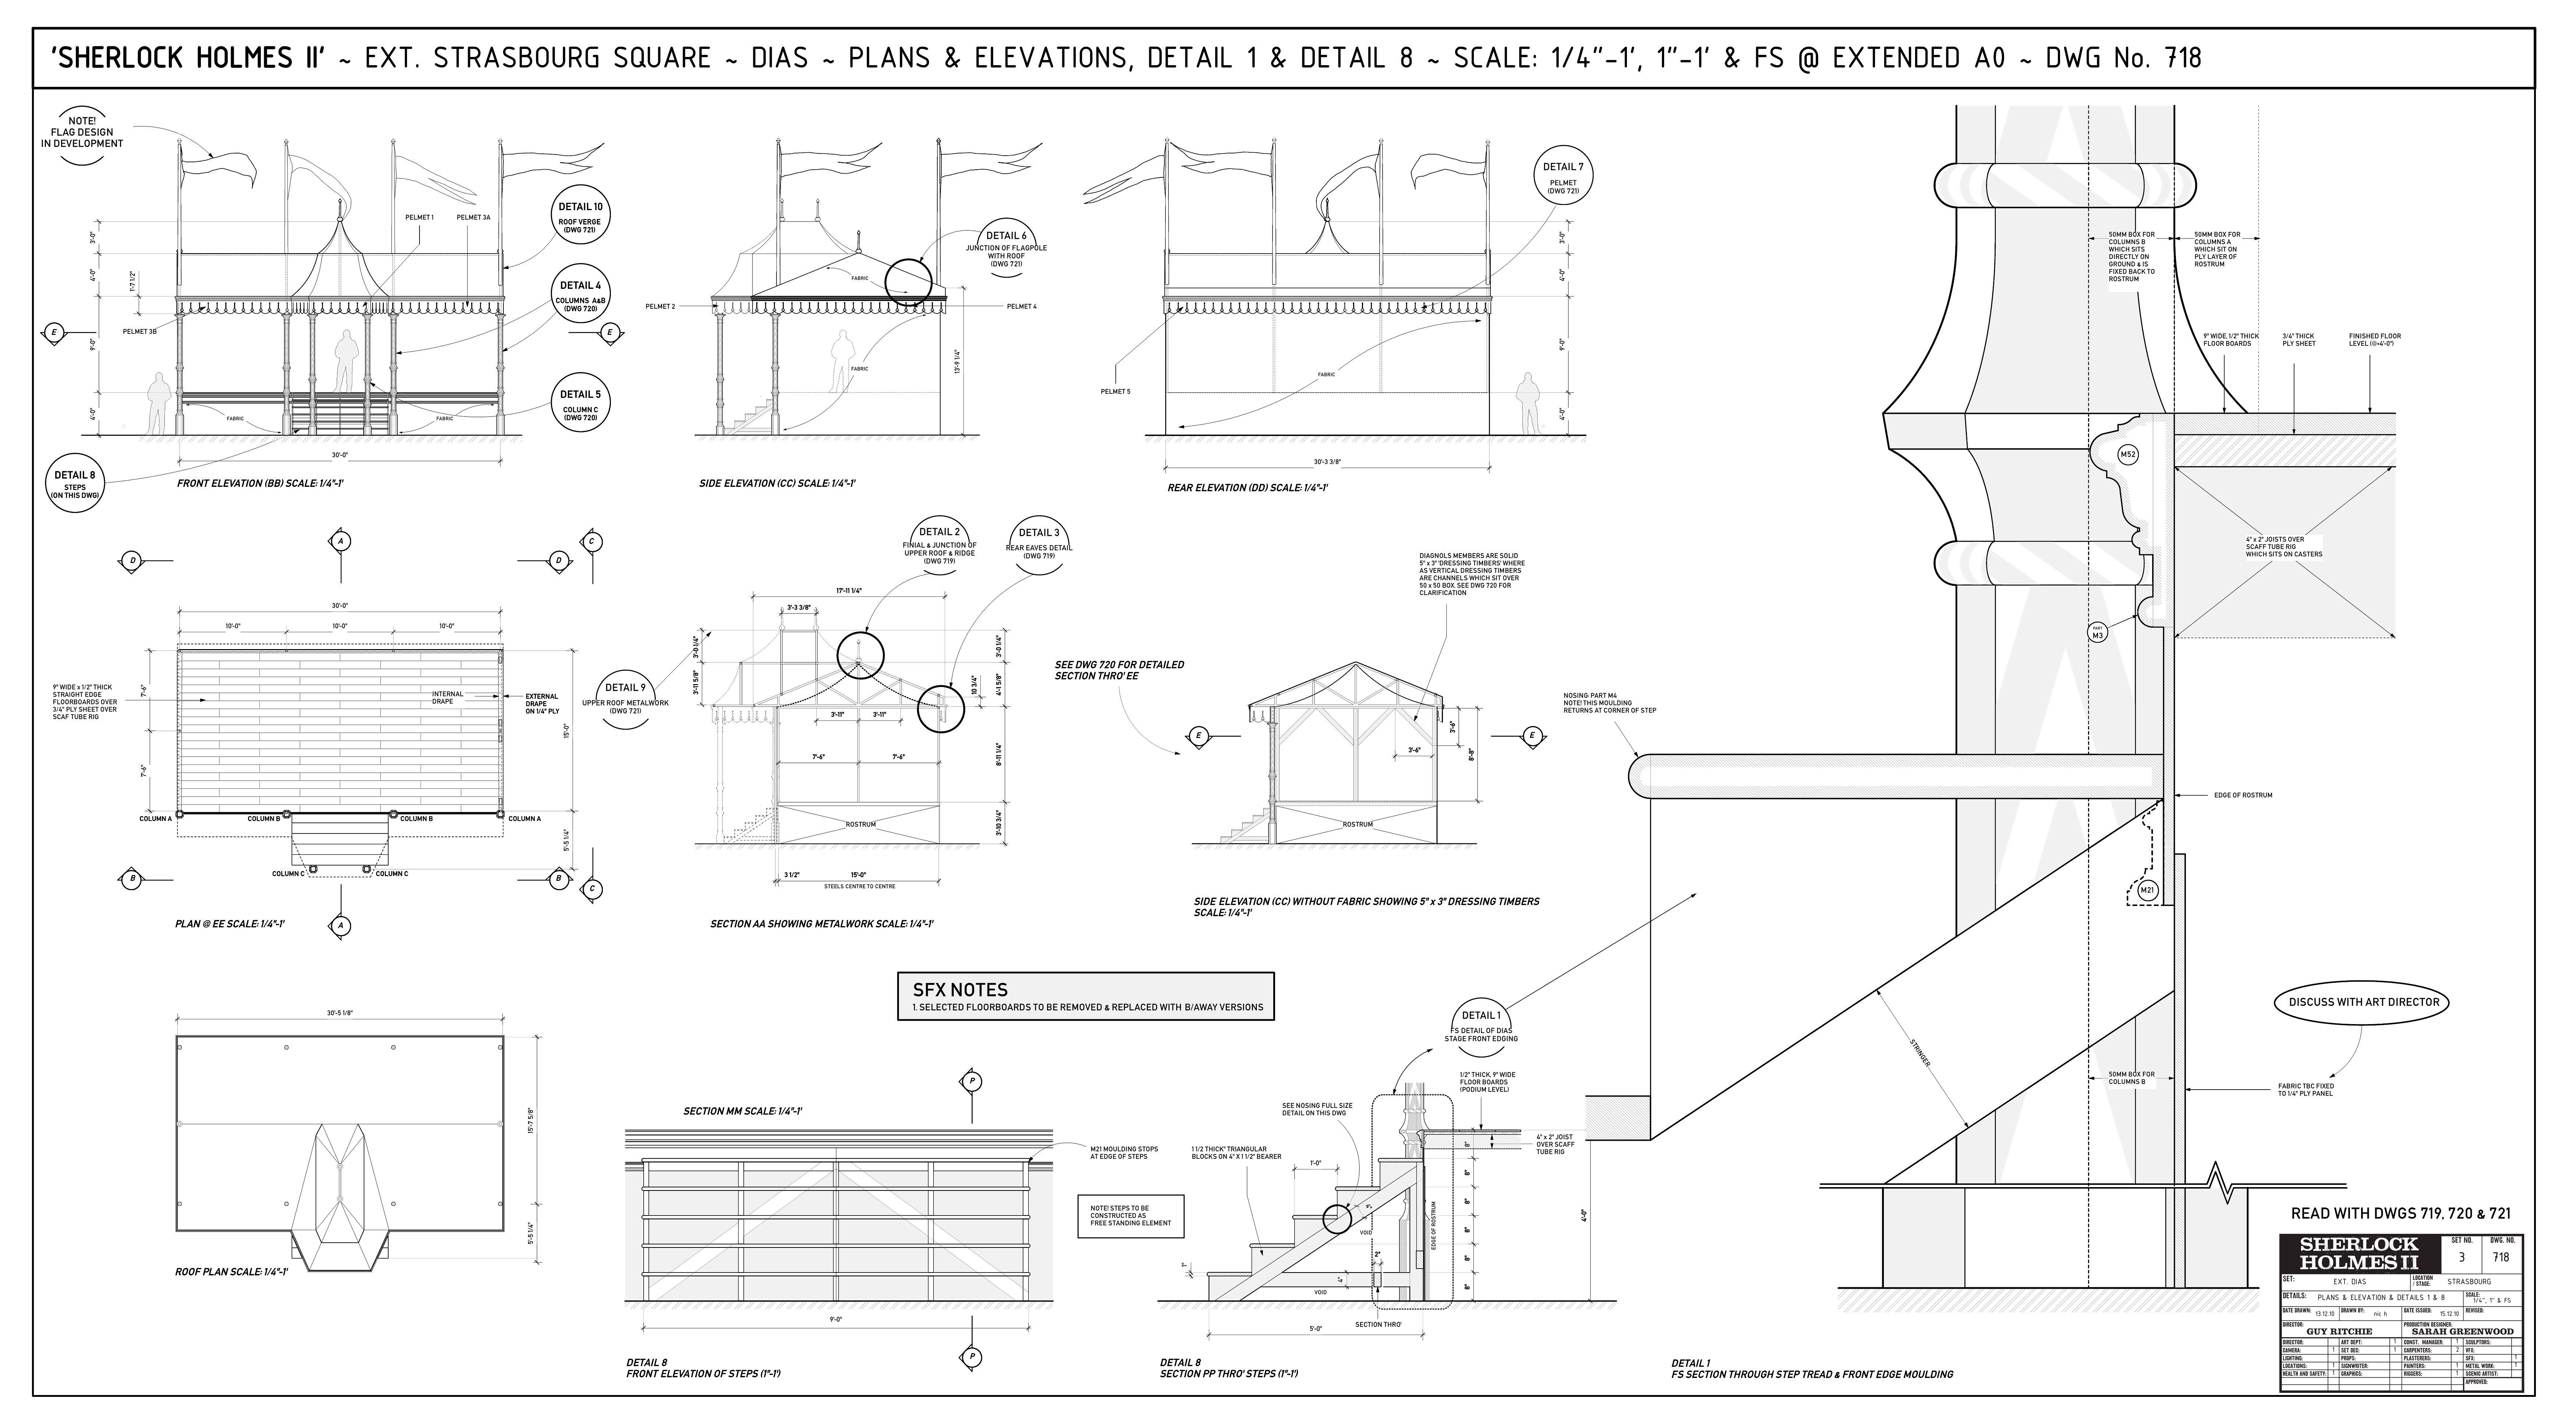 221b Baker Street Floor Plan Strasbourg Dias Plans And Elevations Jpg 7000 215 3848